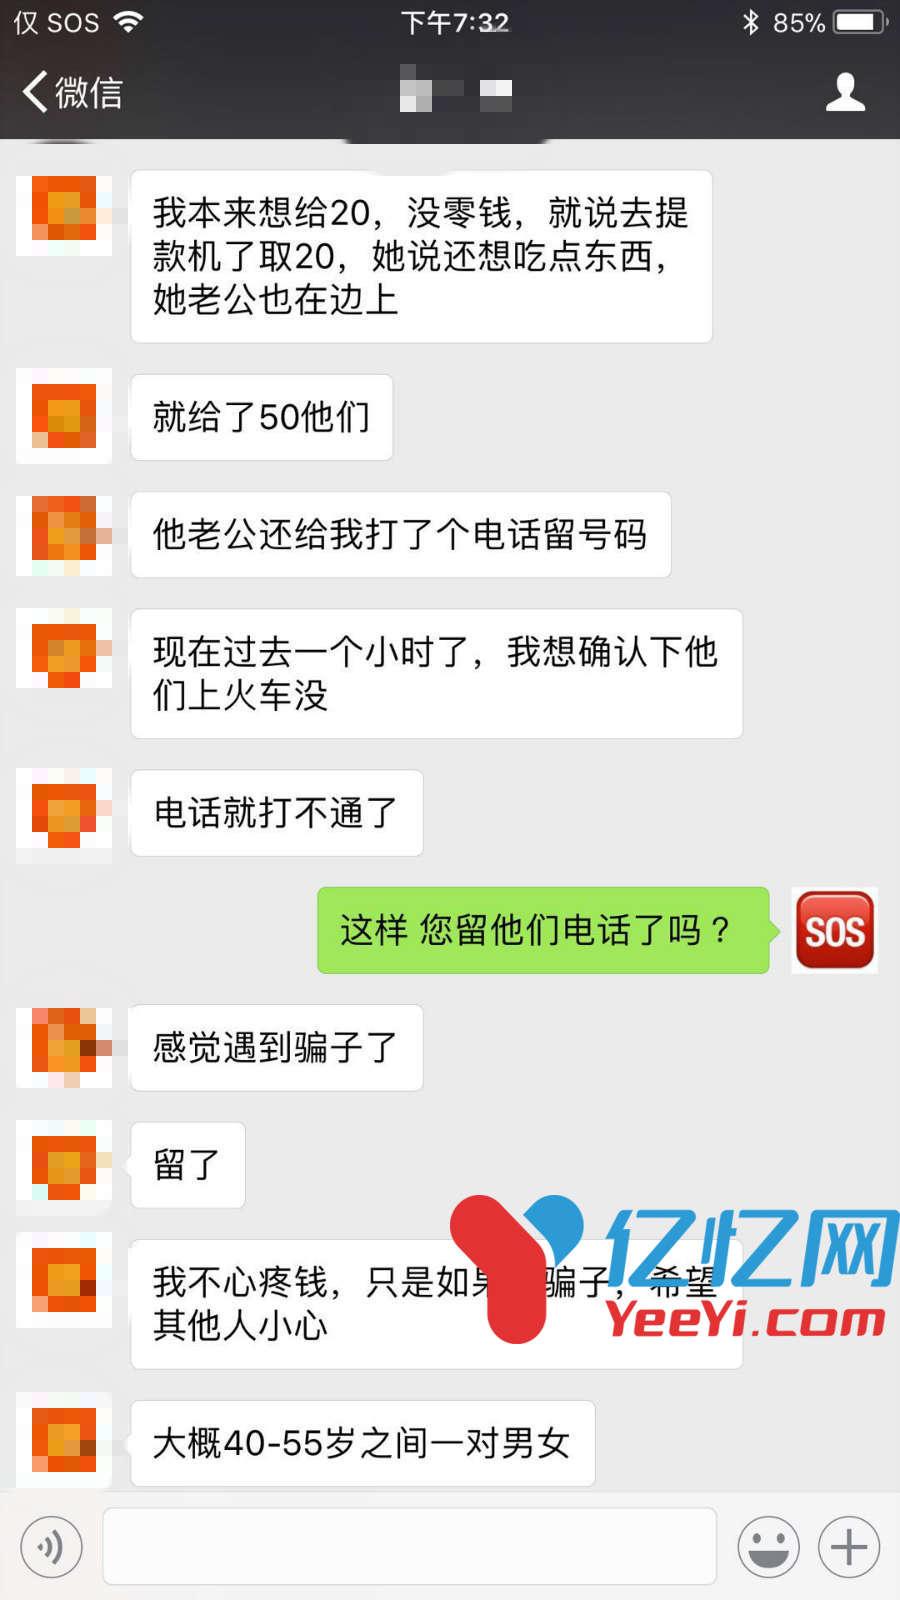 WeChat Image_20180705081715_meitu_2.jpg?x-oss-process=image/format,png